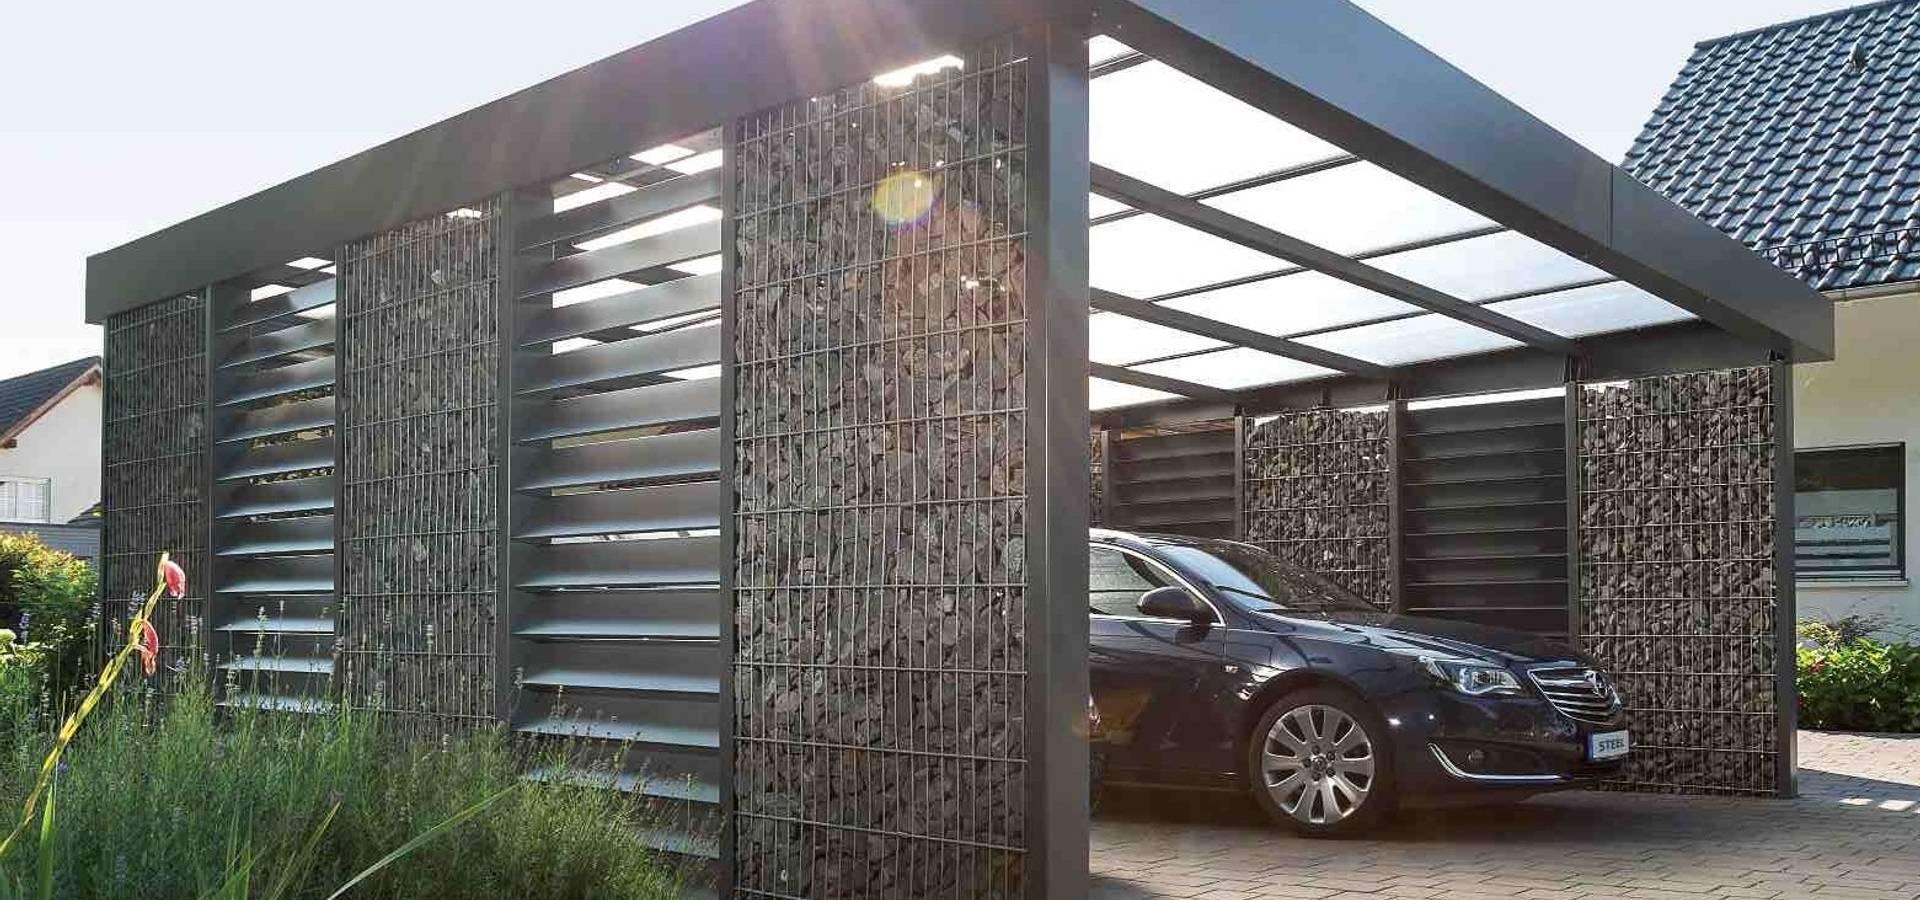 gabionen-doppelcarport par steelmanufaktur beyer | homify